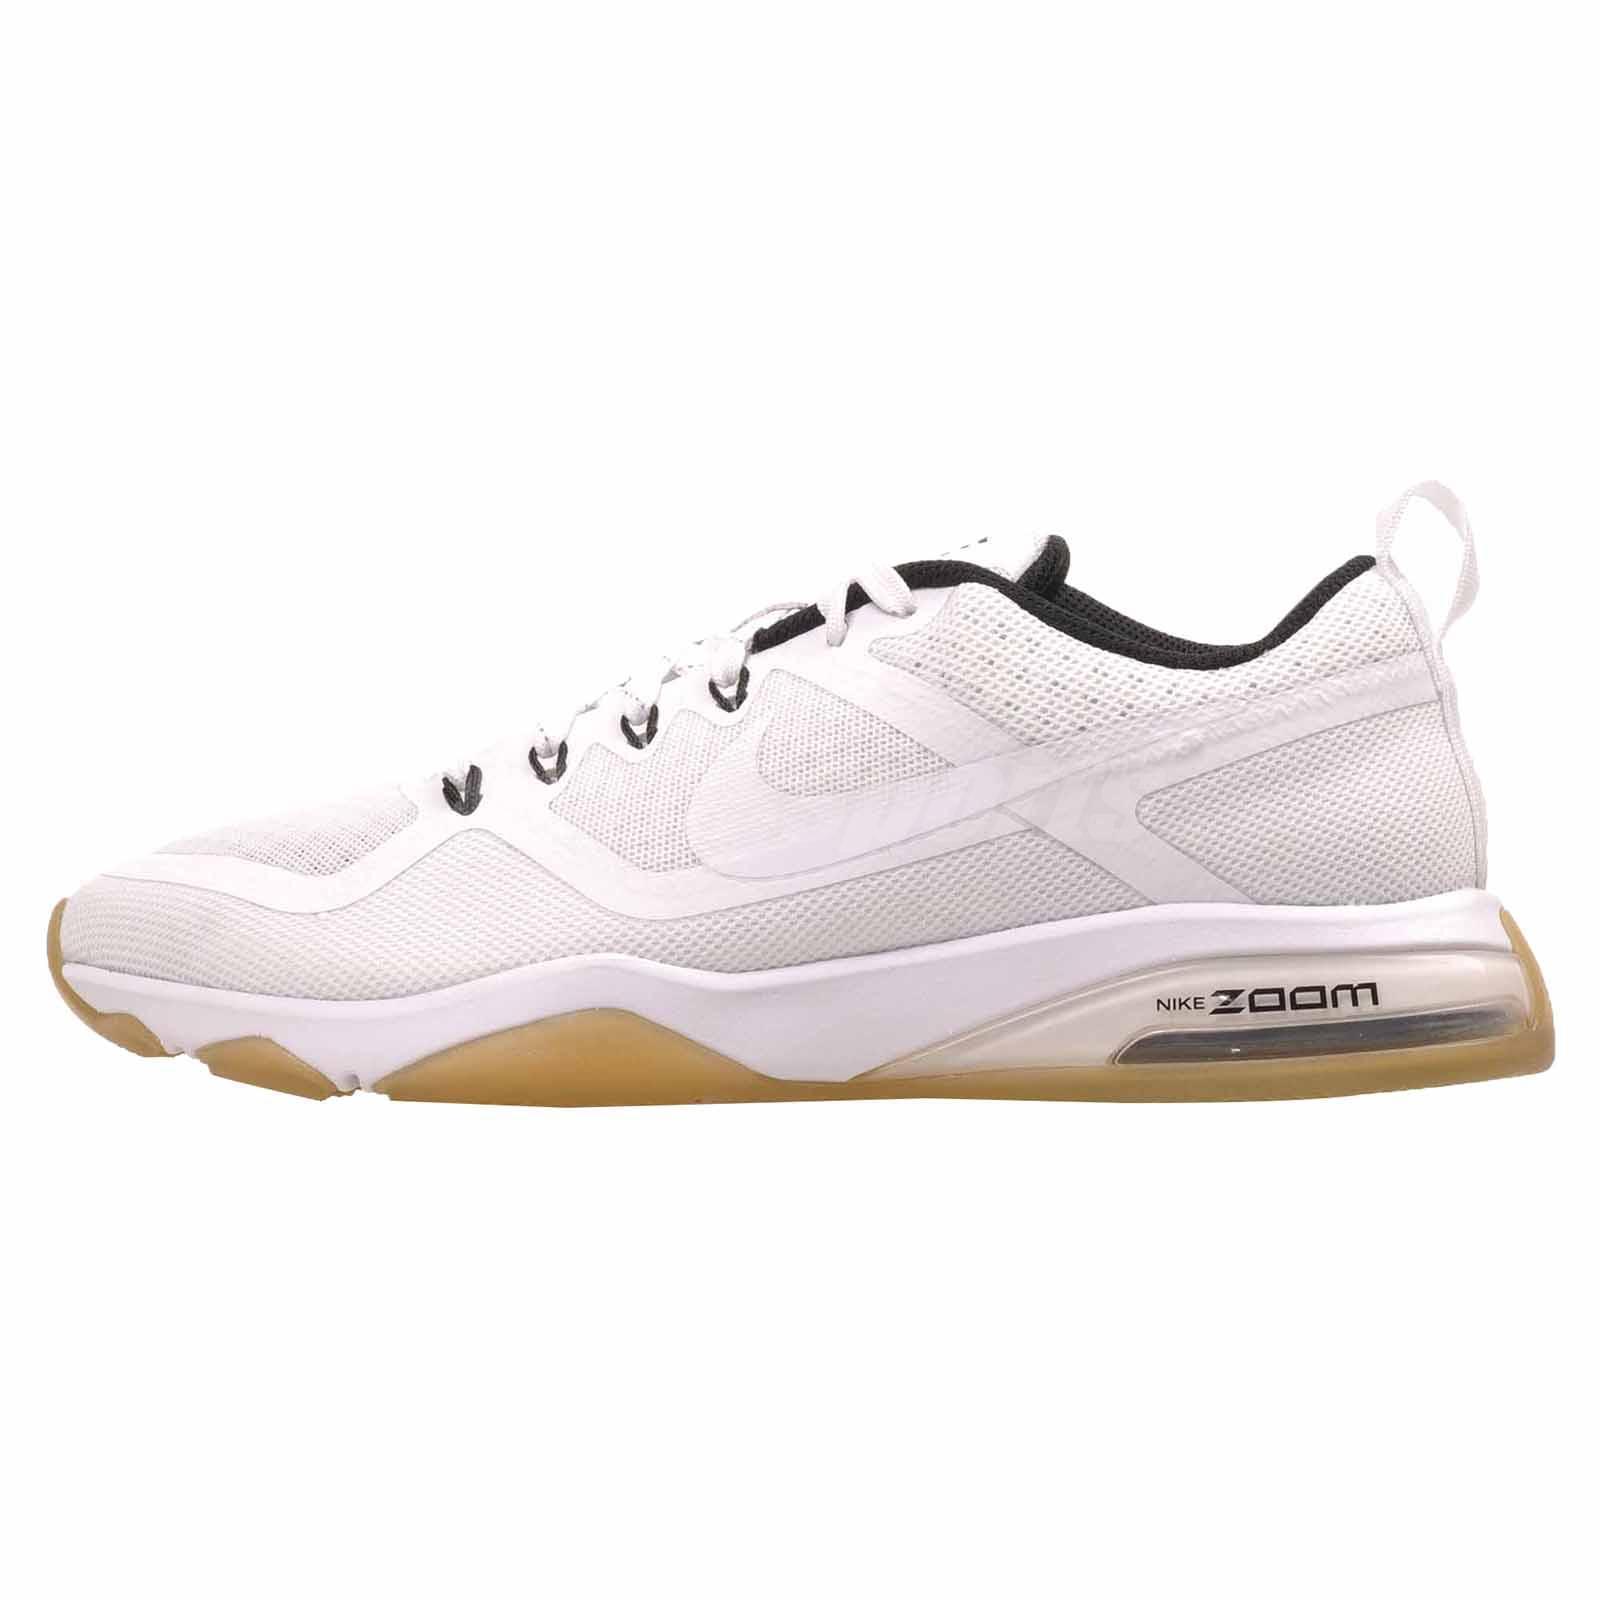 Nike Wmns Air Zoom Fitness Cross Training Womens Shoes White Black 904645-101